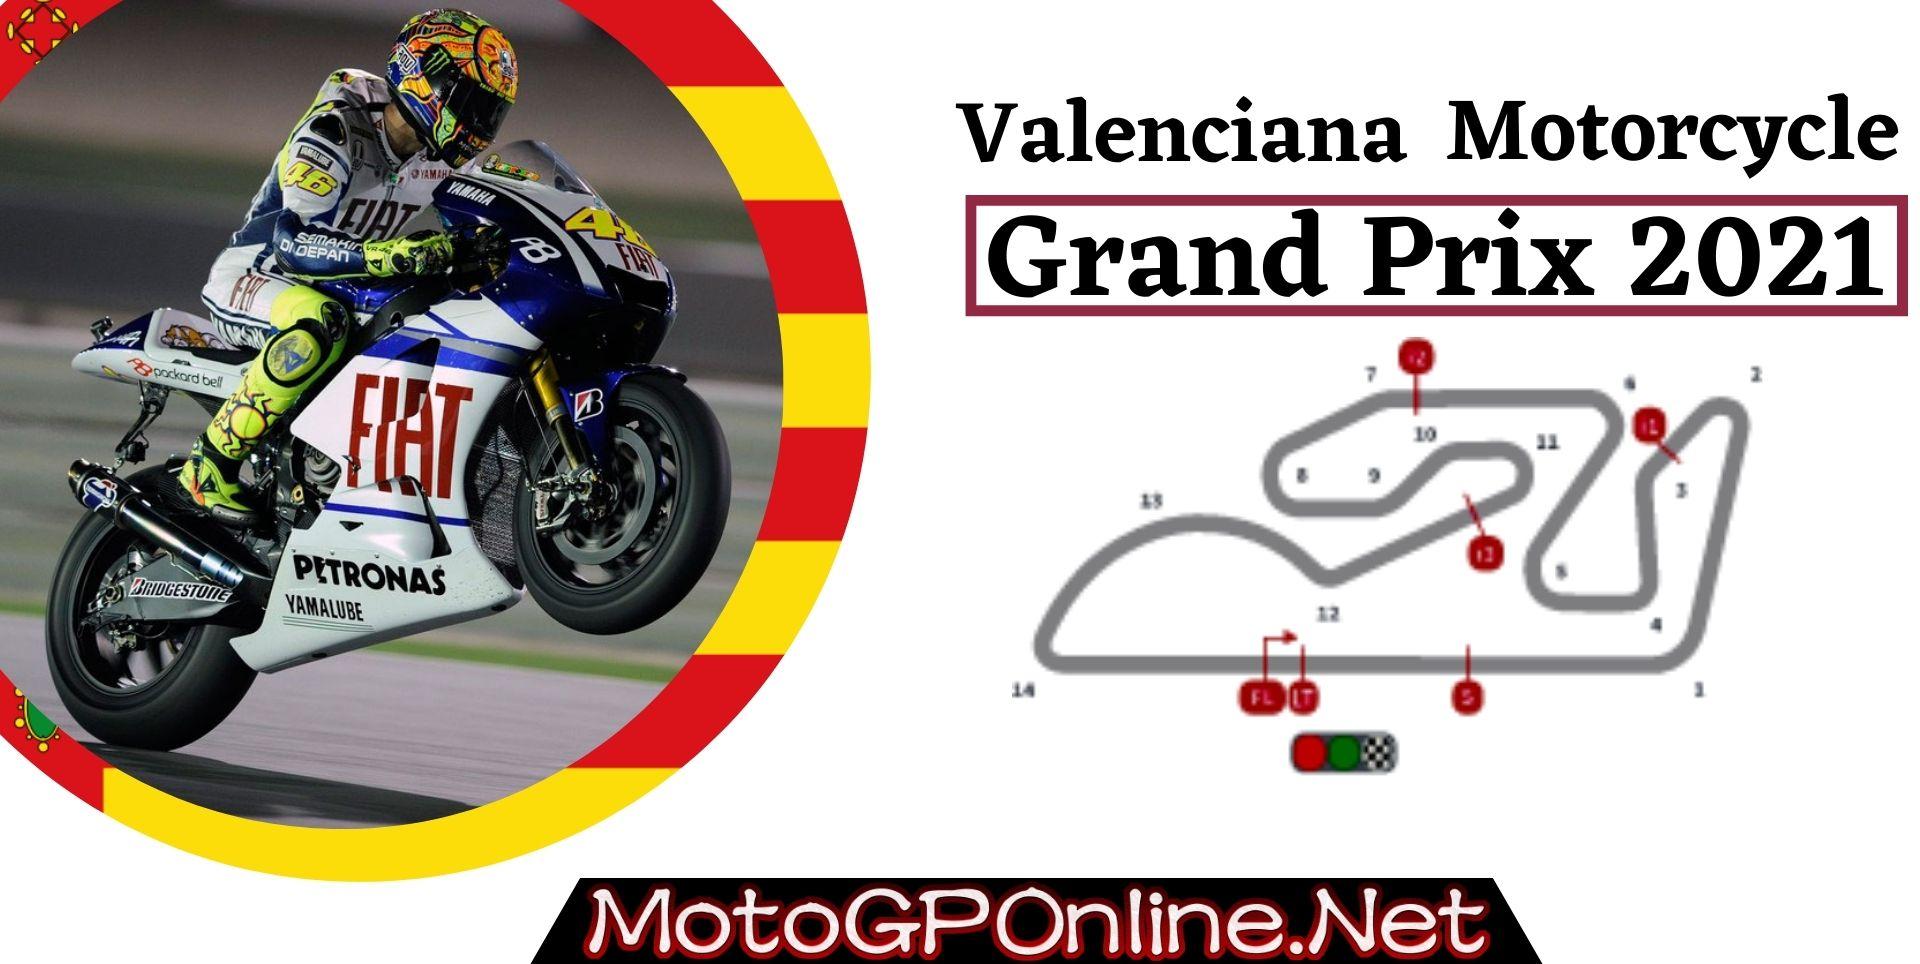 Valenciana Grand Prix Live Stream MotoGP 2021 | Full Race Replay